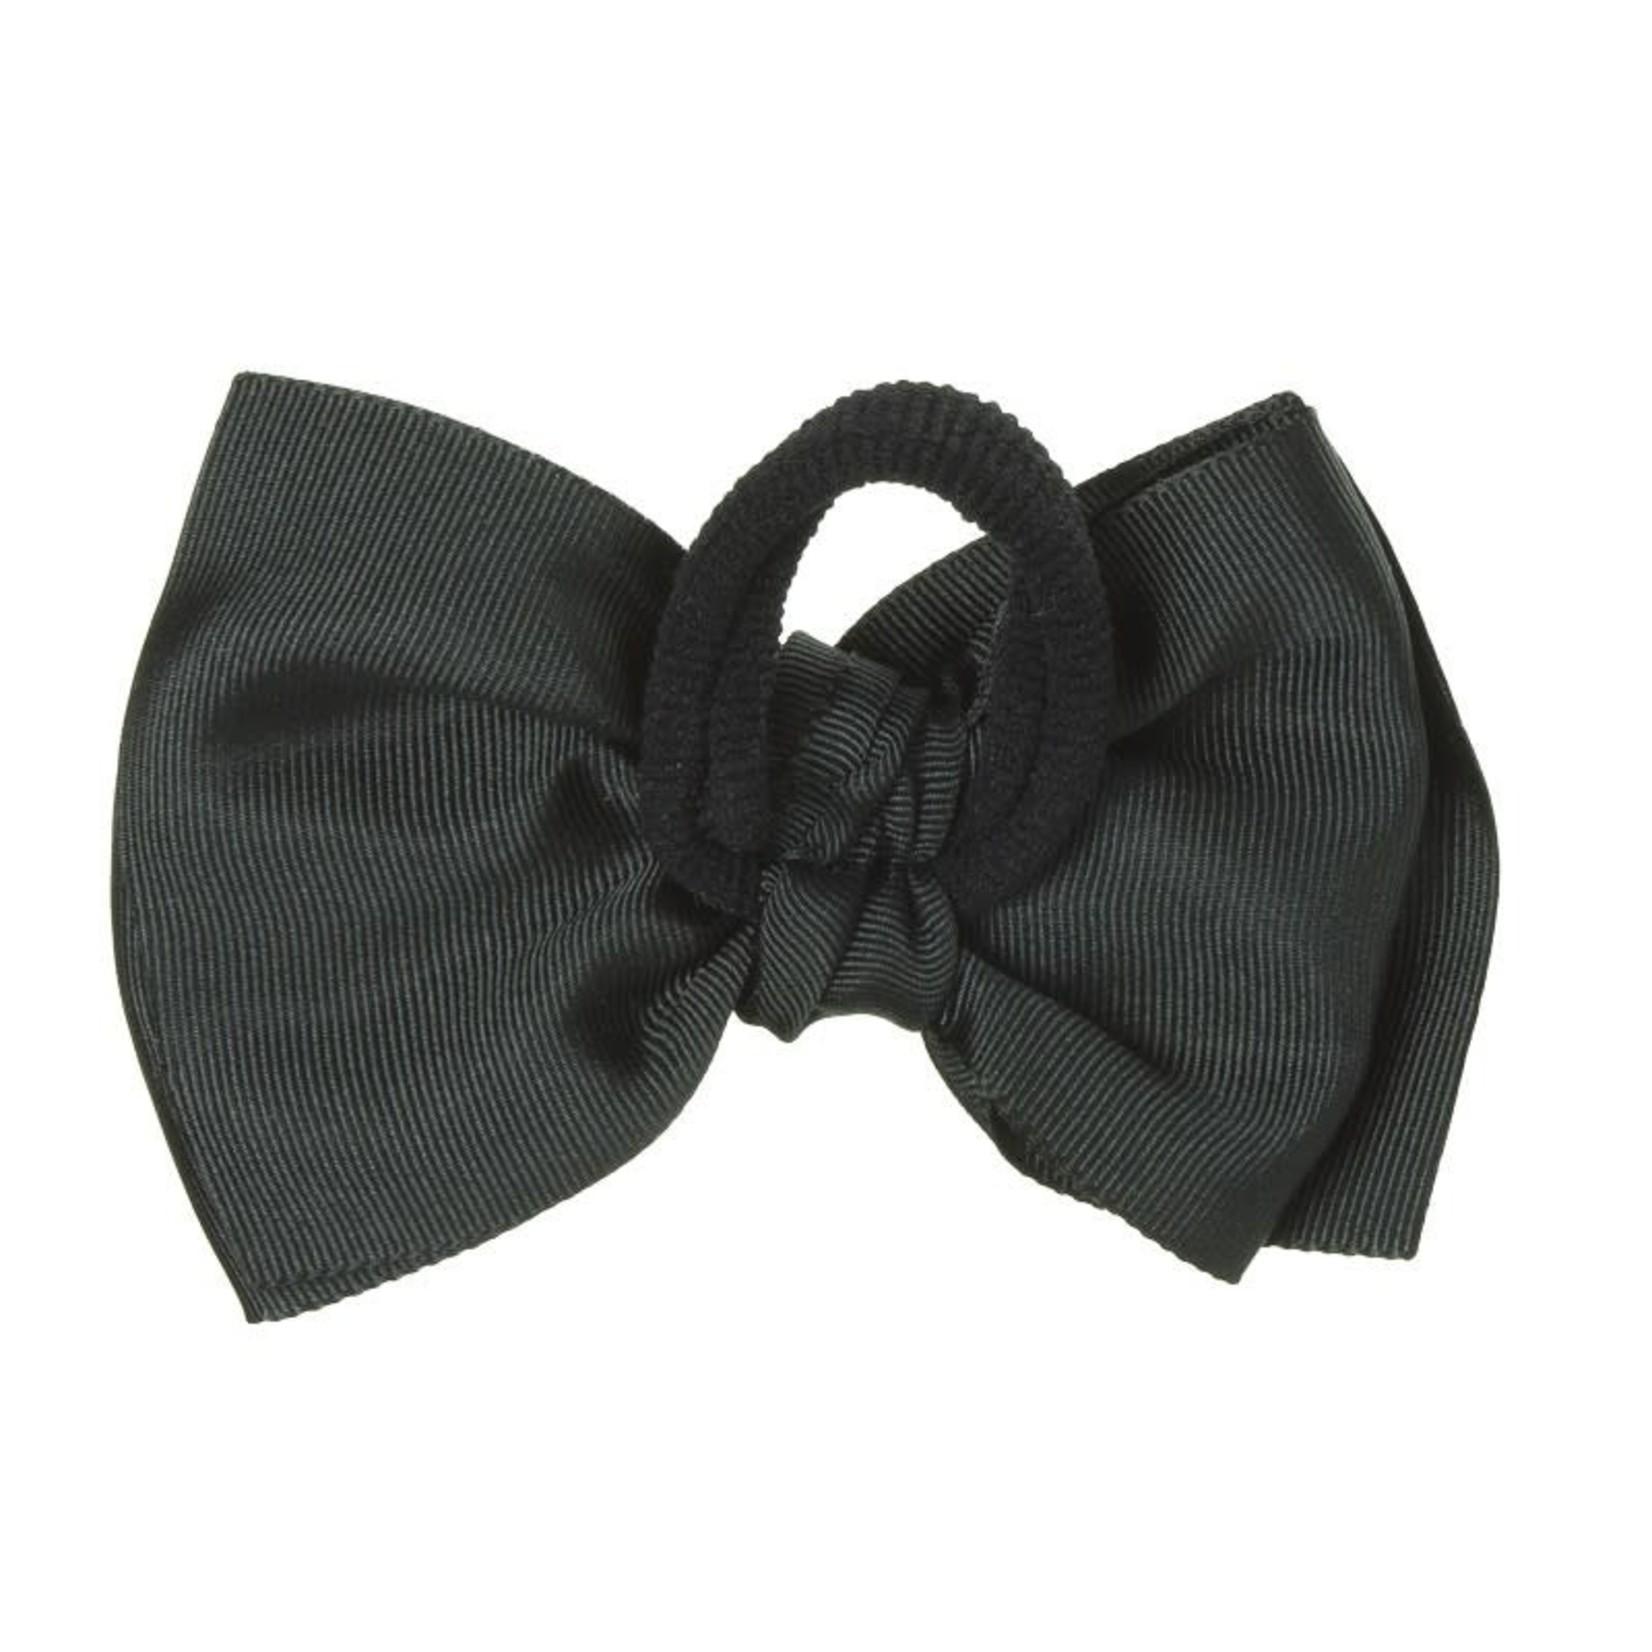 Hair Bow - Black